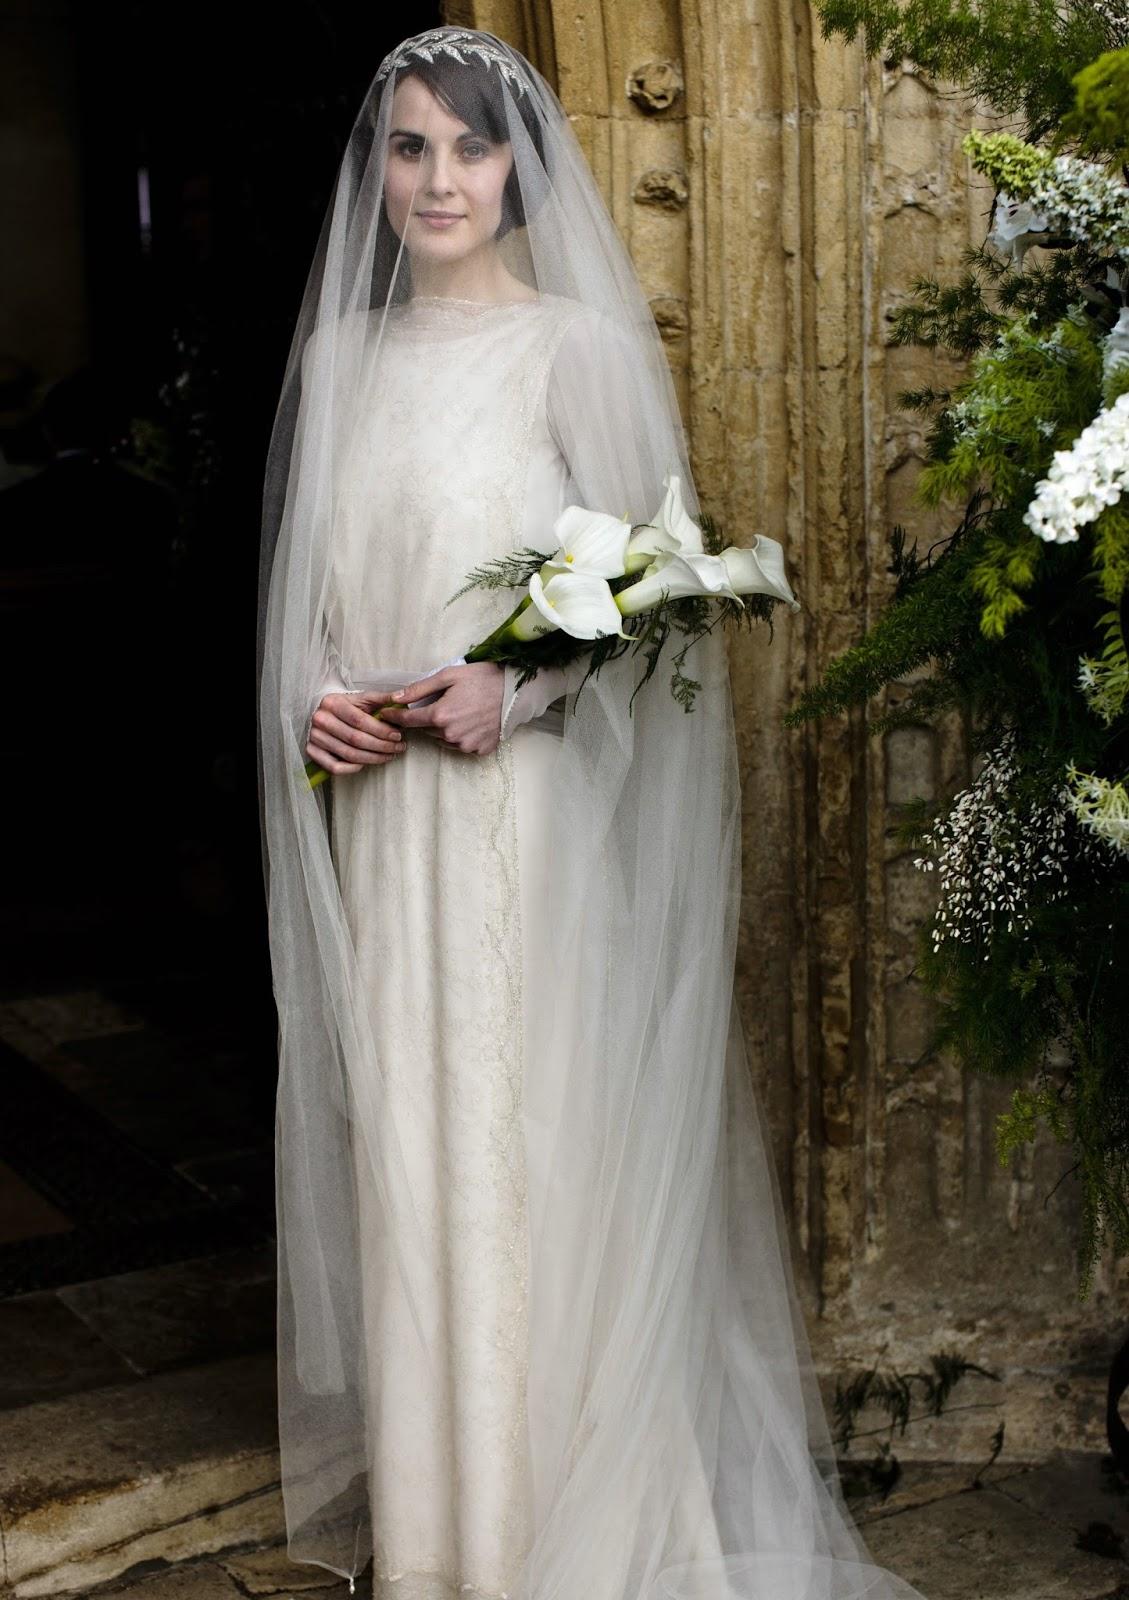 dressybridal marrys long sleeved wedding dress��downton